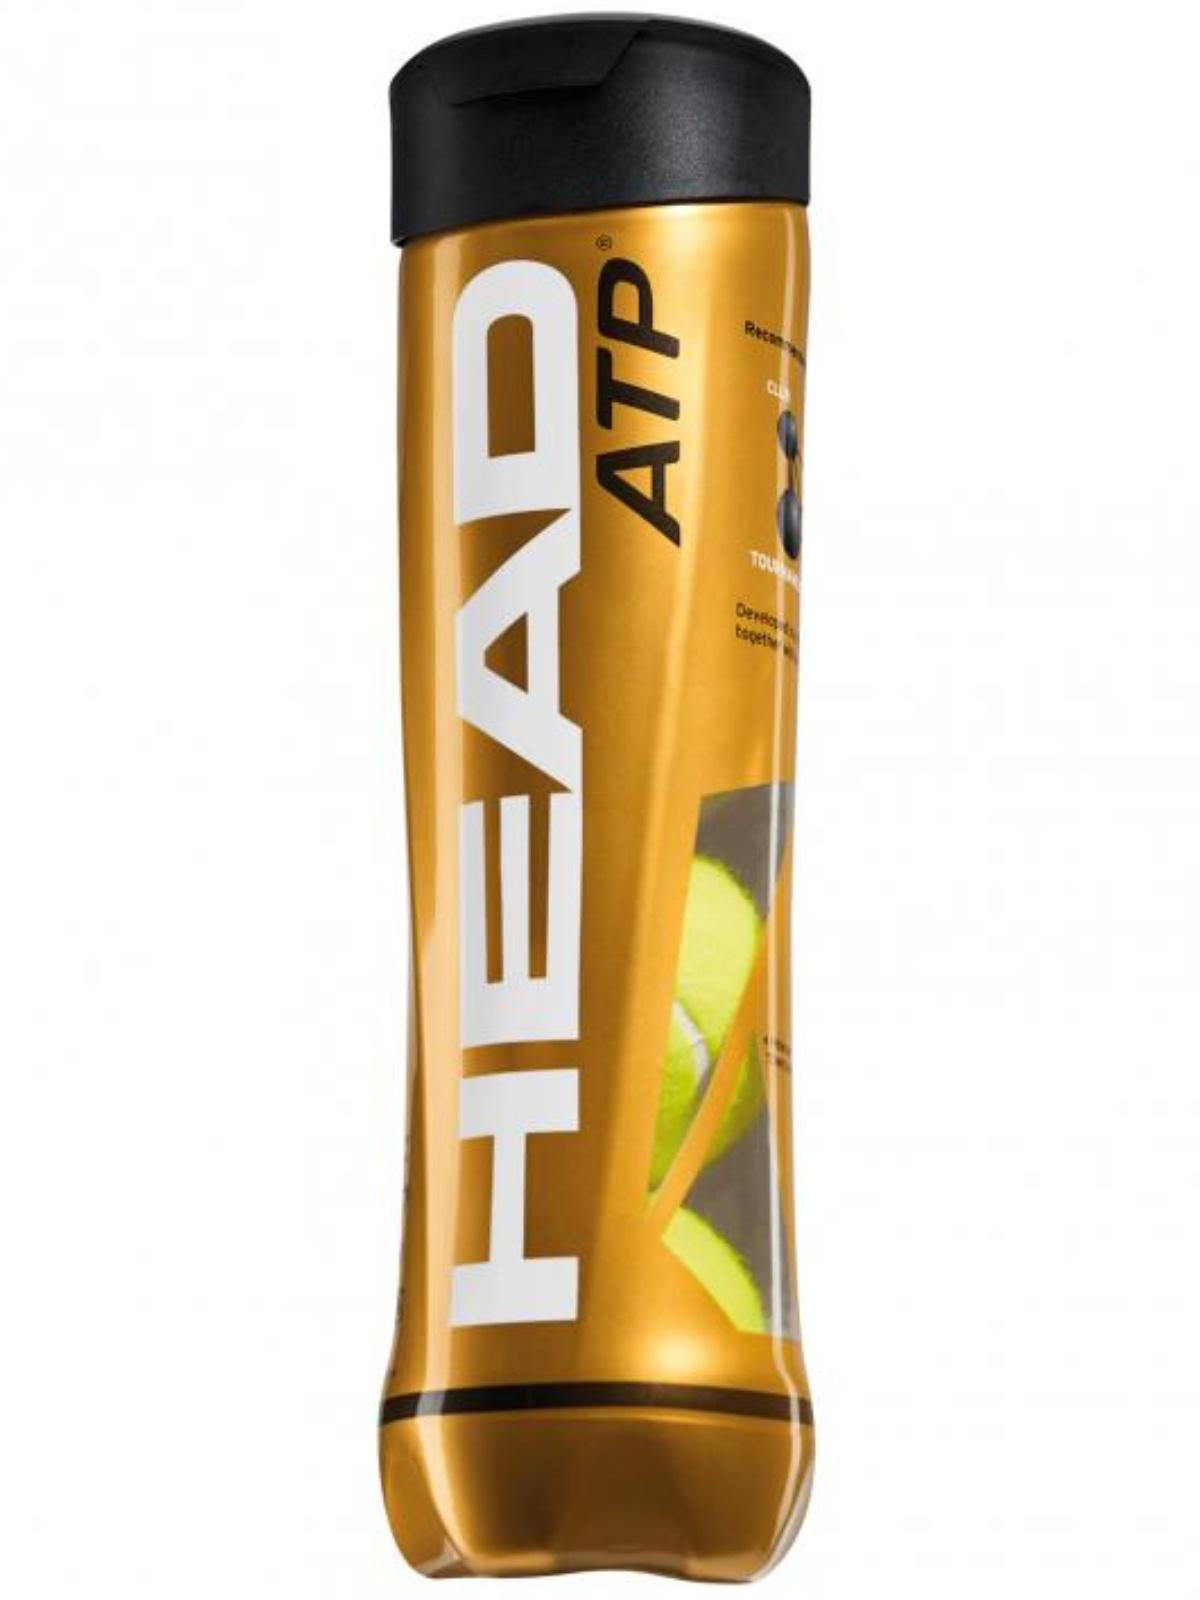 Tenisové loptičky HEAD ATP metal 4 ks